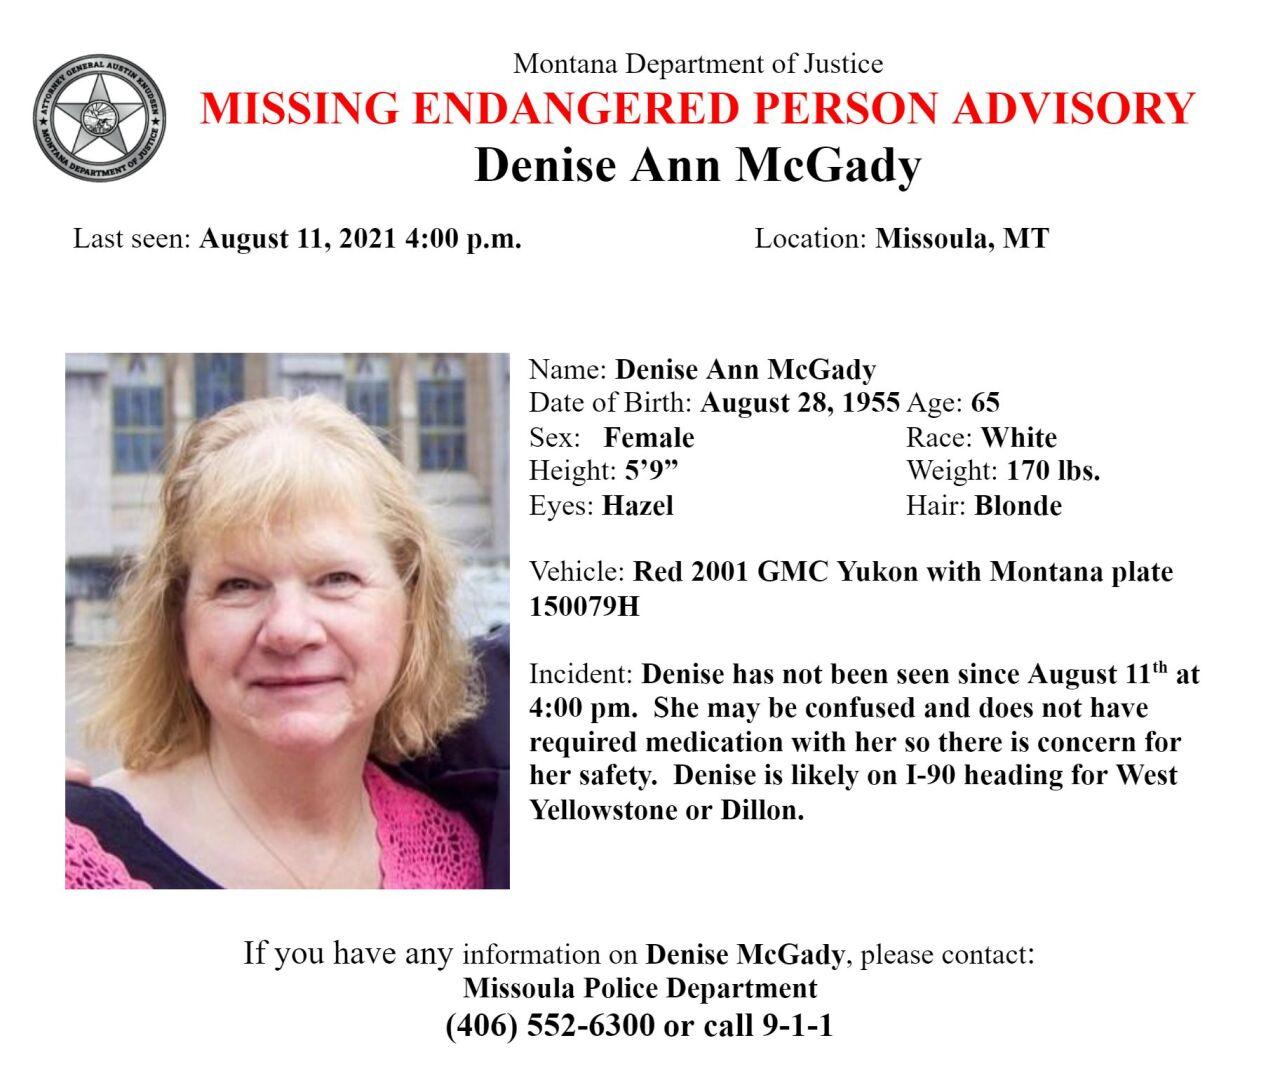 Missing-Endangered Person Advisory for Denise Ann McGady of Missoula